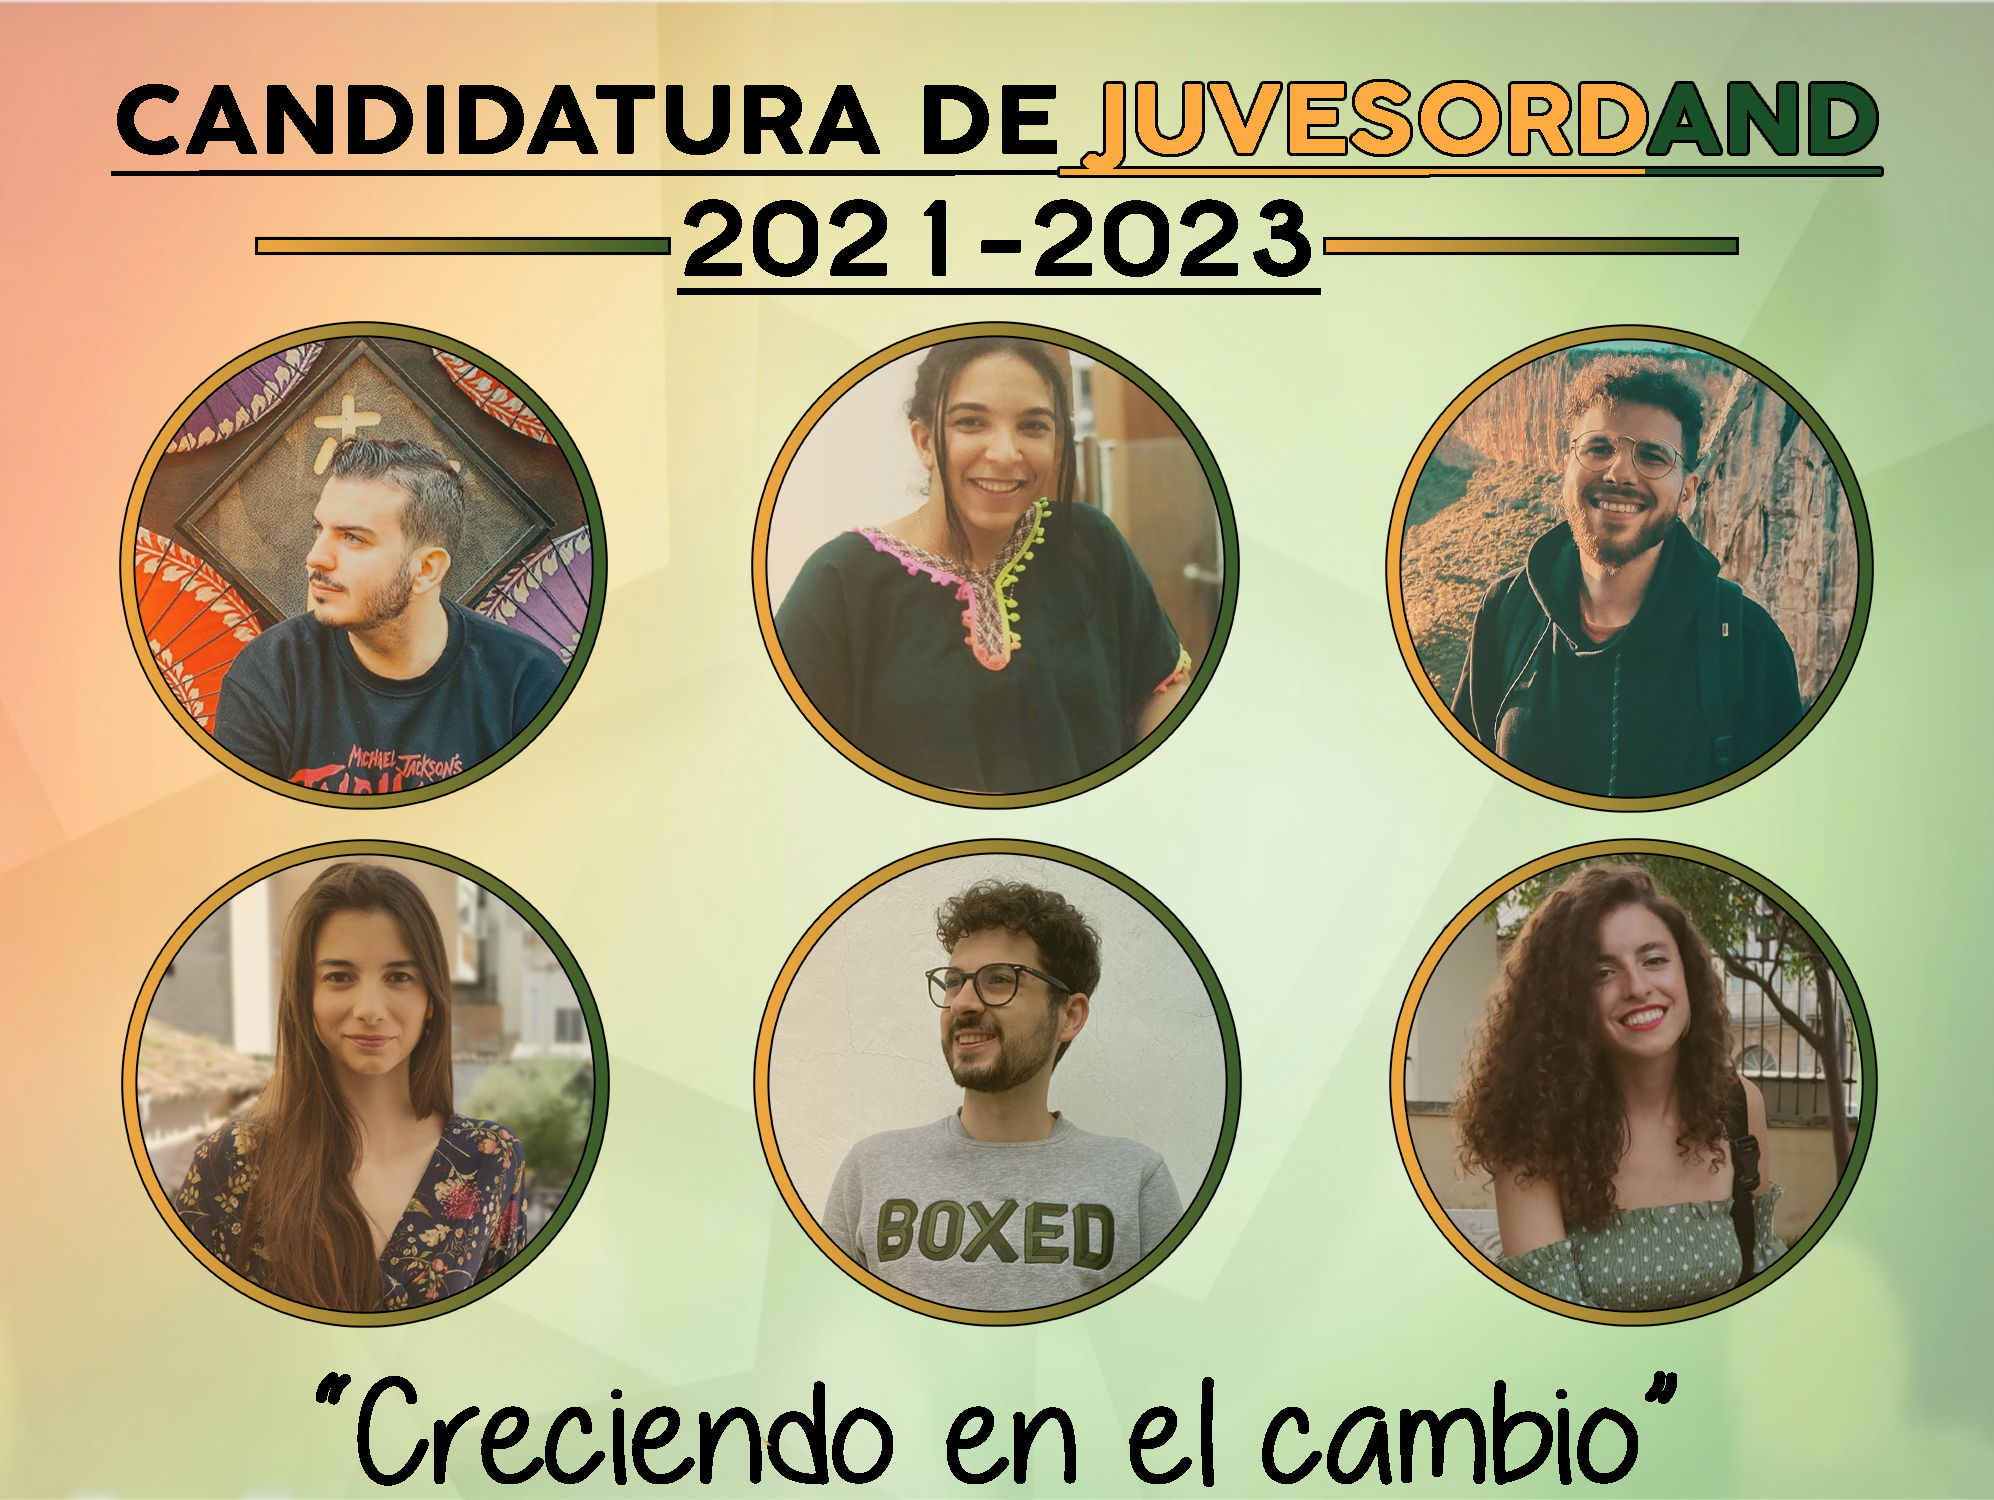 CANDIDATURA DE LA JUVESORDAND (2021-2023)